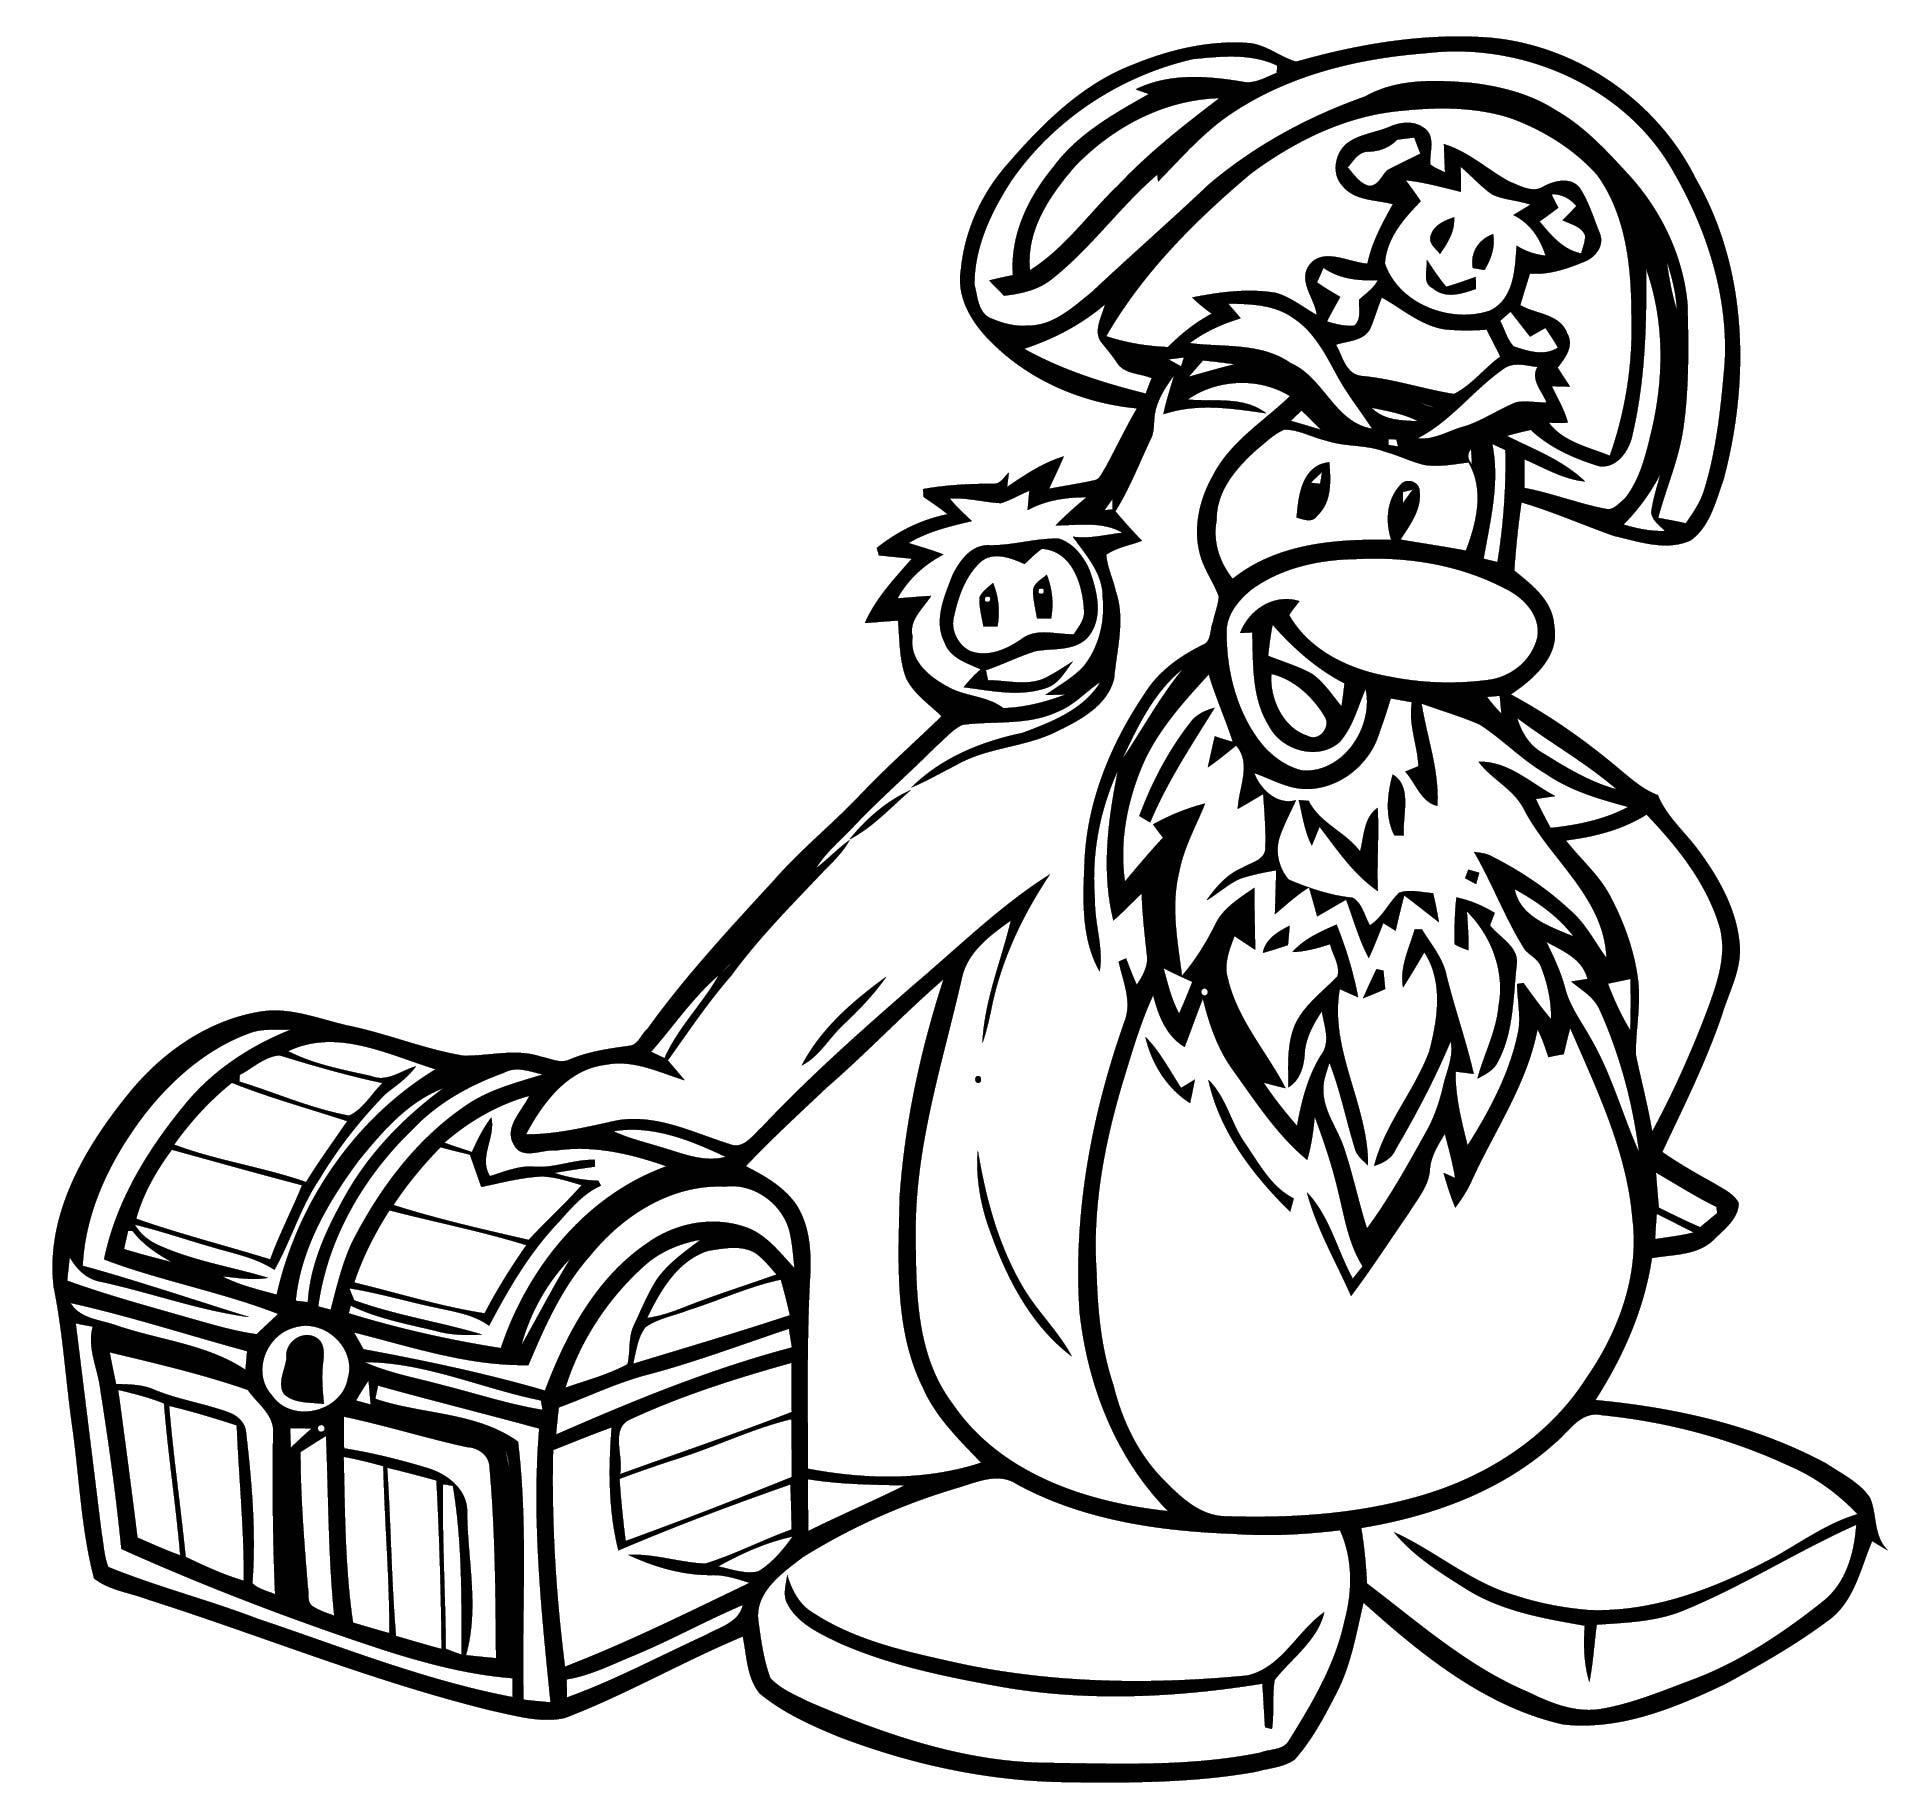 club penguin coloring pages of rockhopper exploration | Rockhopper Club Penguin Coloring Page | Wecoloringpage.com